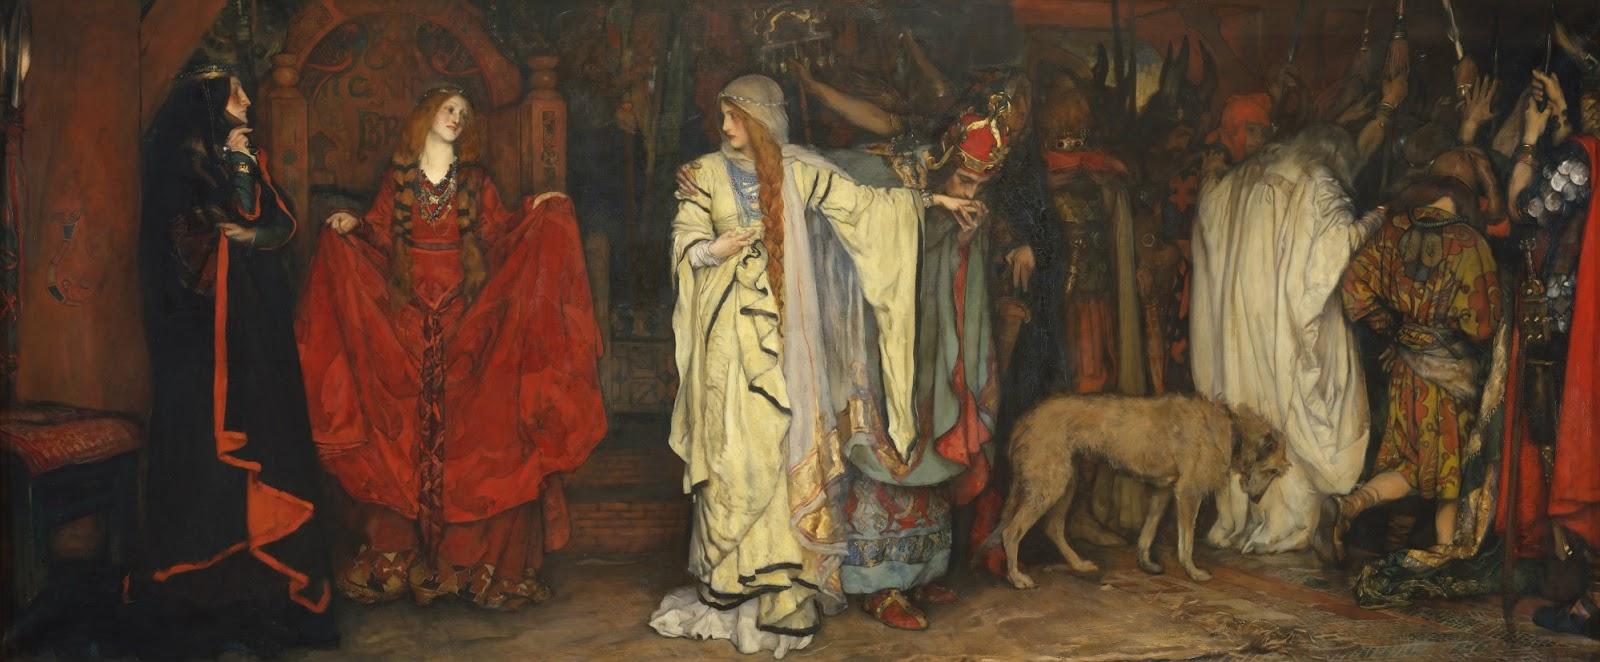 Duke of cornwall king lear wife sexual dysfunction